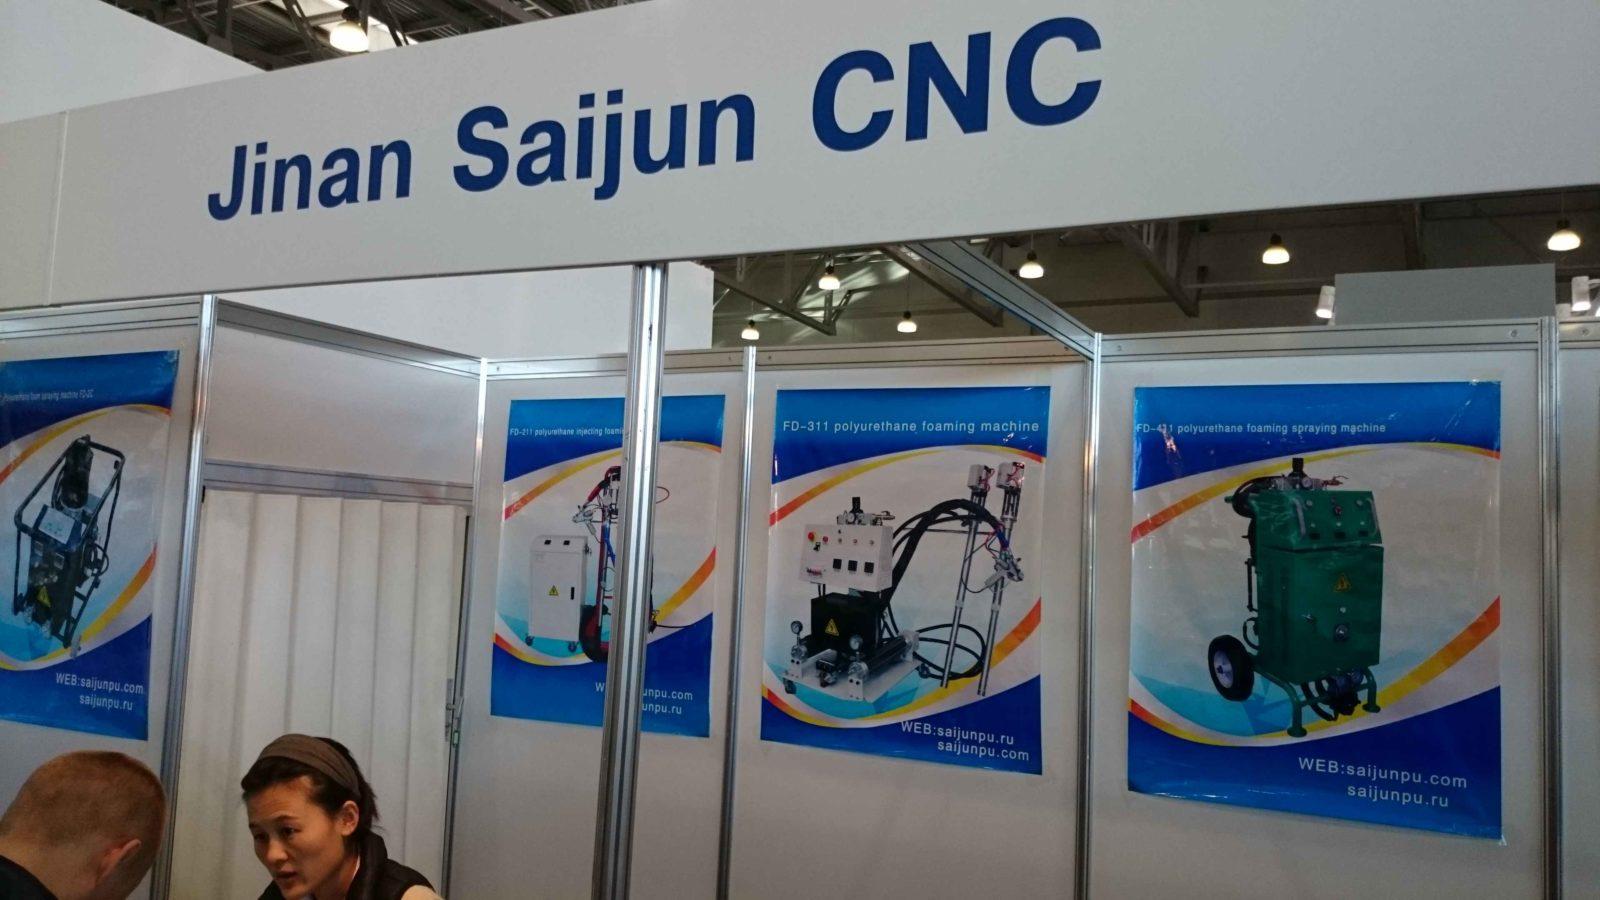 Japan Saijun SNS Technology CO установки высокого давления